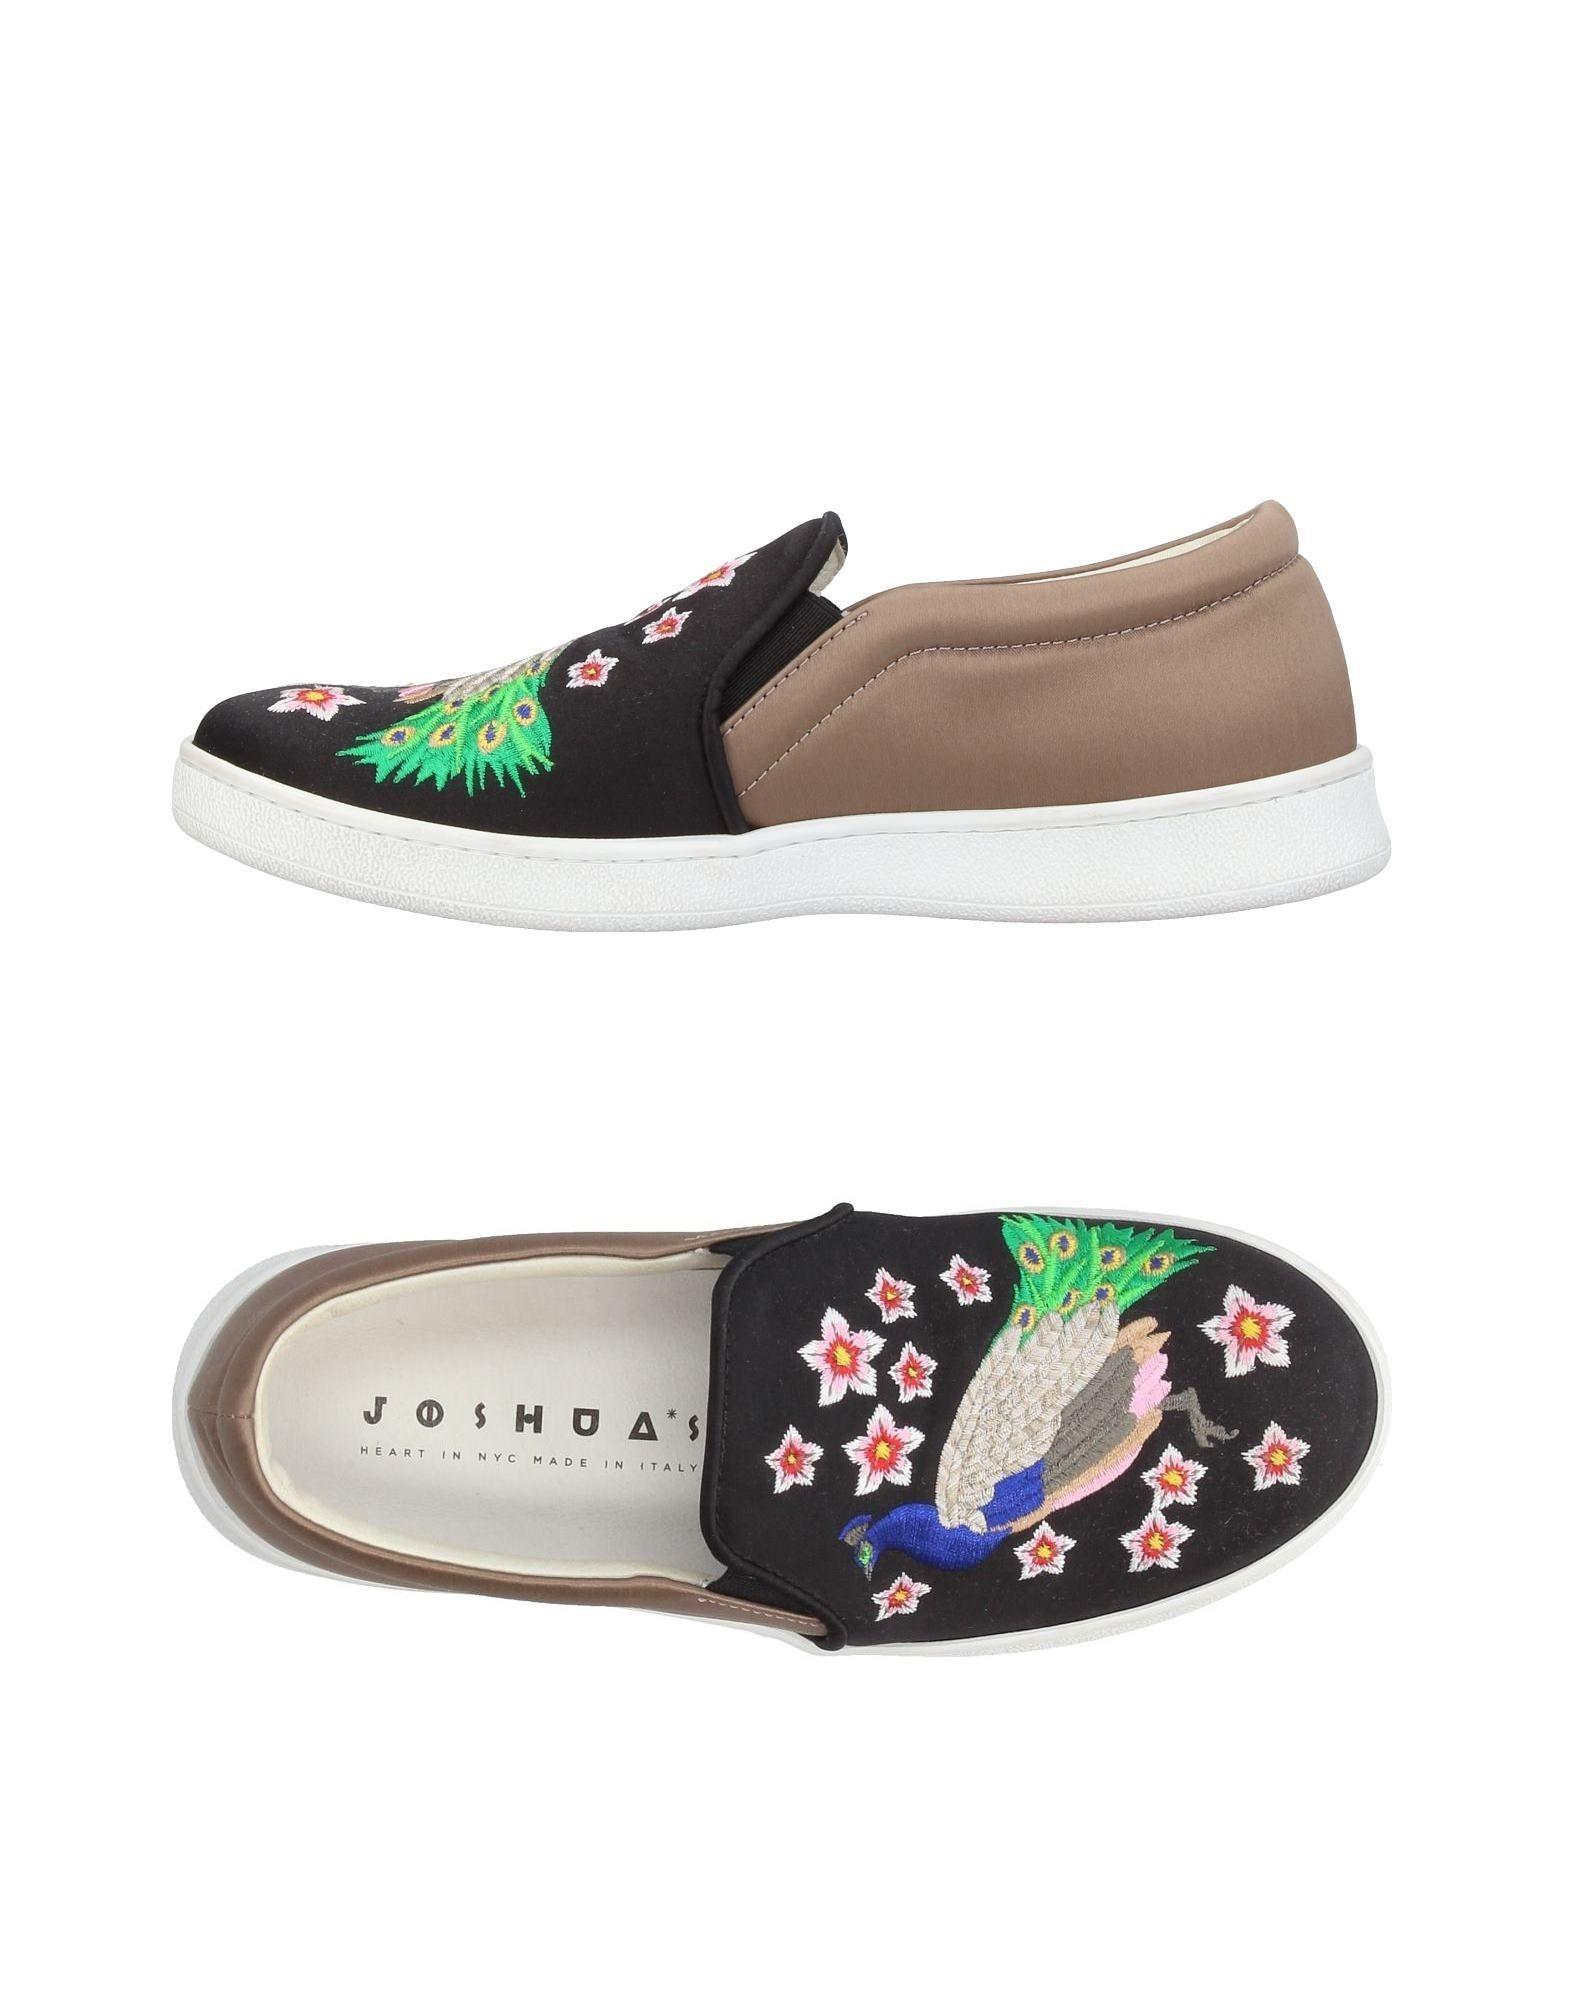 Joshua*S Sneakers Damen  11415268PPGut aussehende strapazierfähige Schuhe